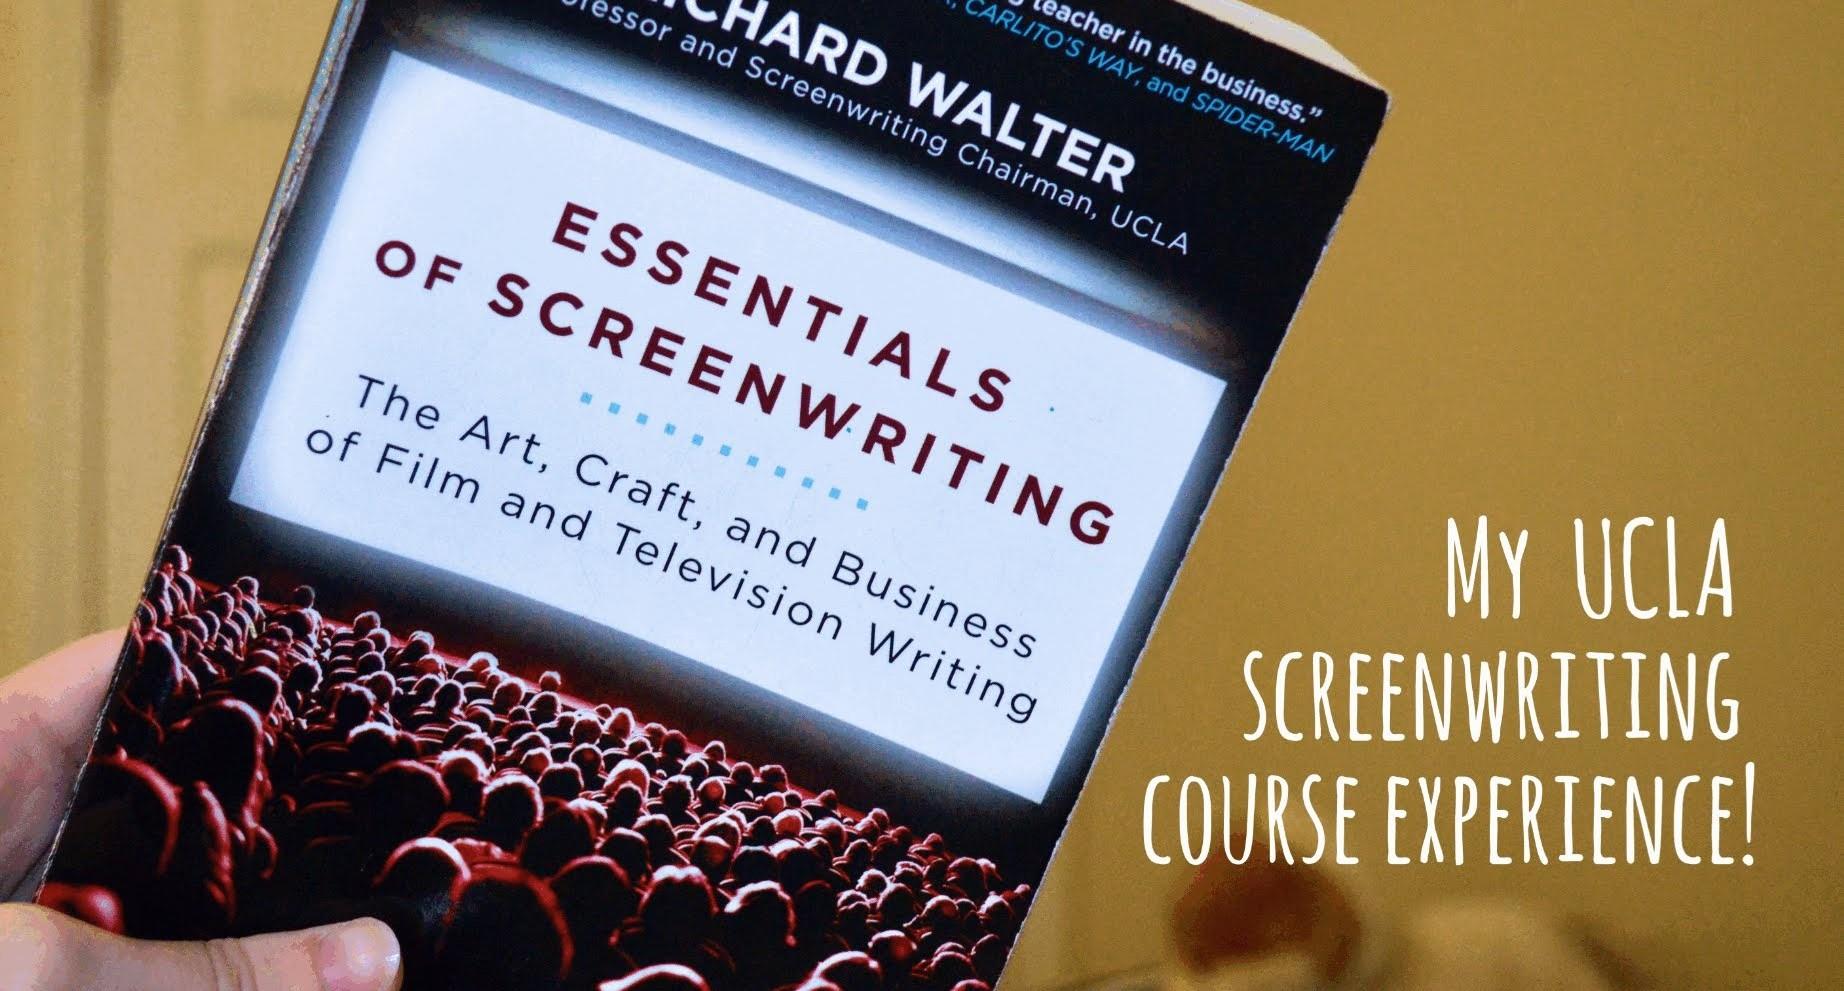 Best Screenwriting Books: ESSENTIALS OF SCREENWRITING - thescriptblog.com